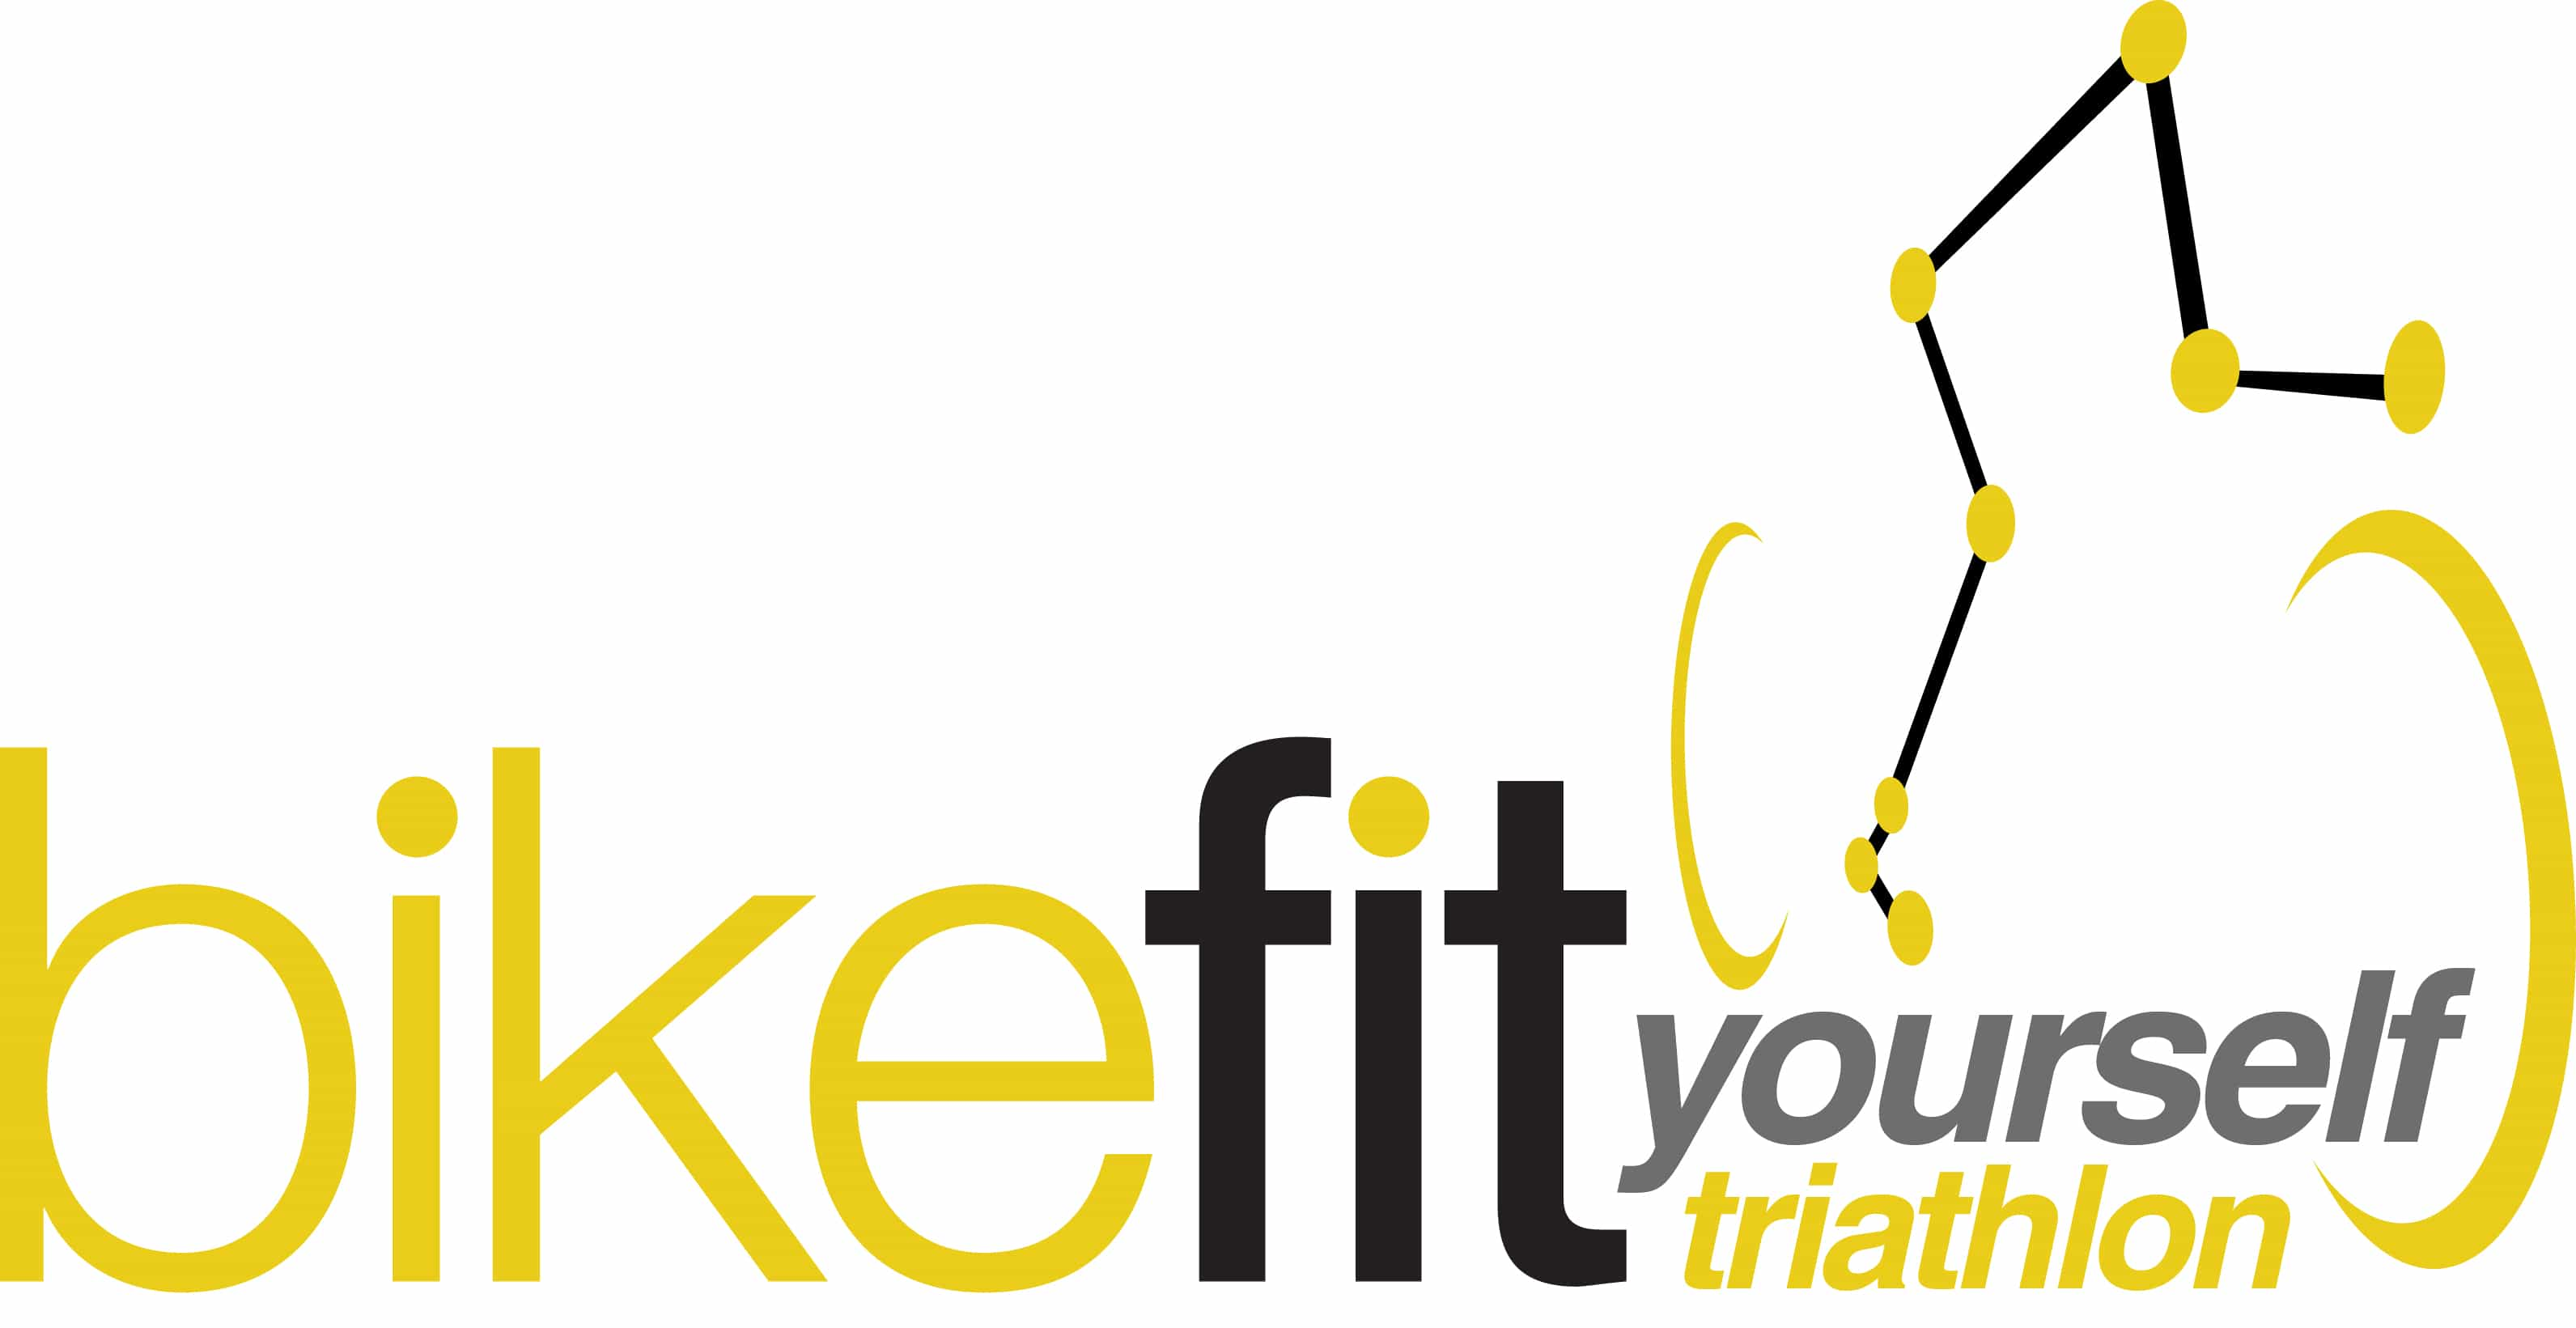 Bike Fit Yourself Triathlon